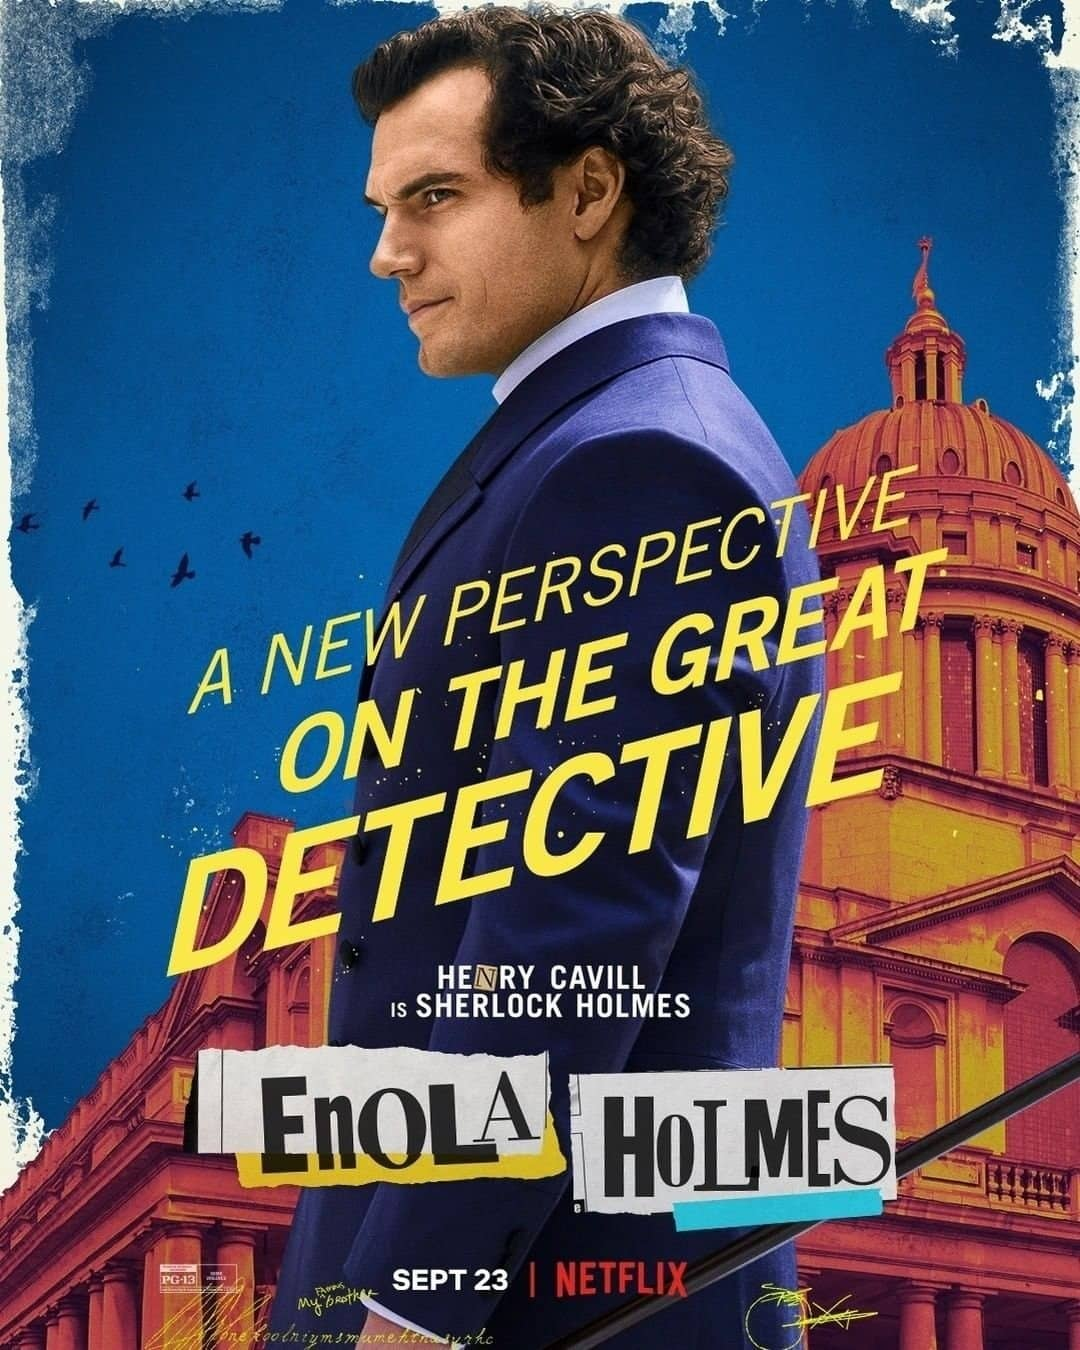 Henry Cavill Enola Holmes Character Poster